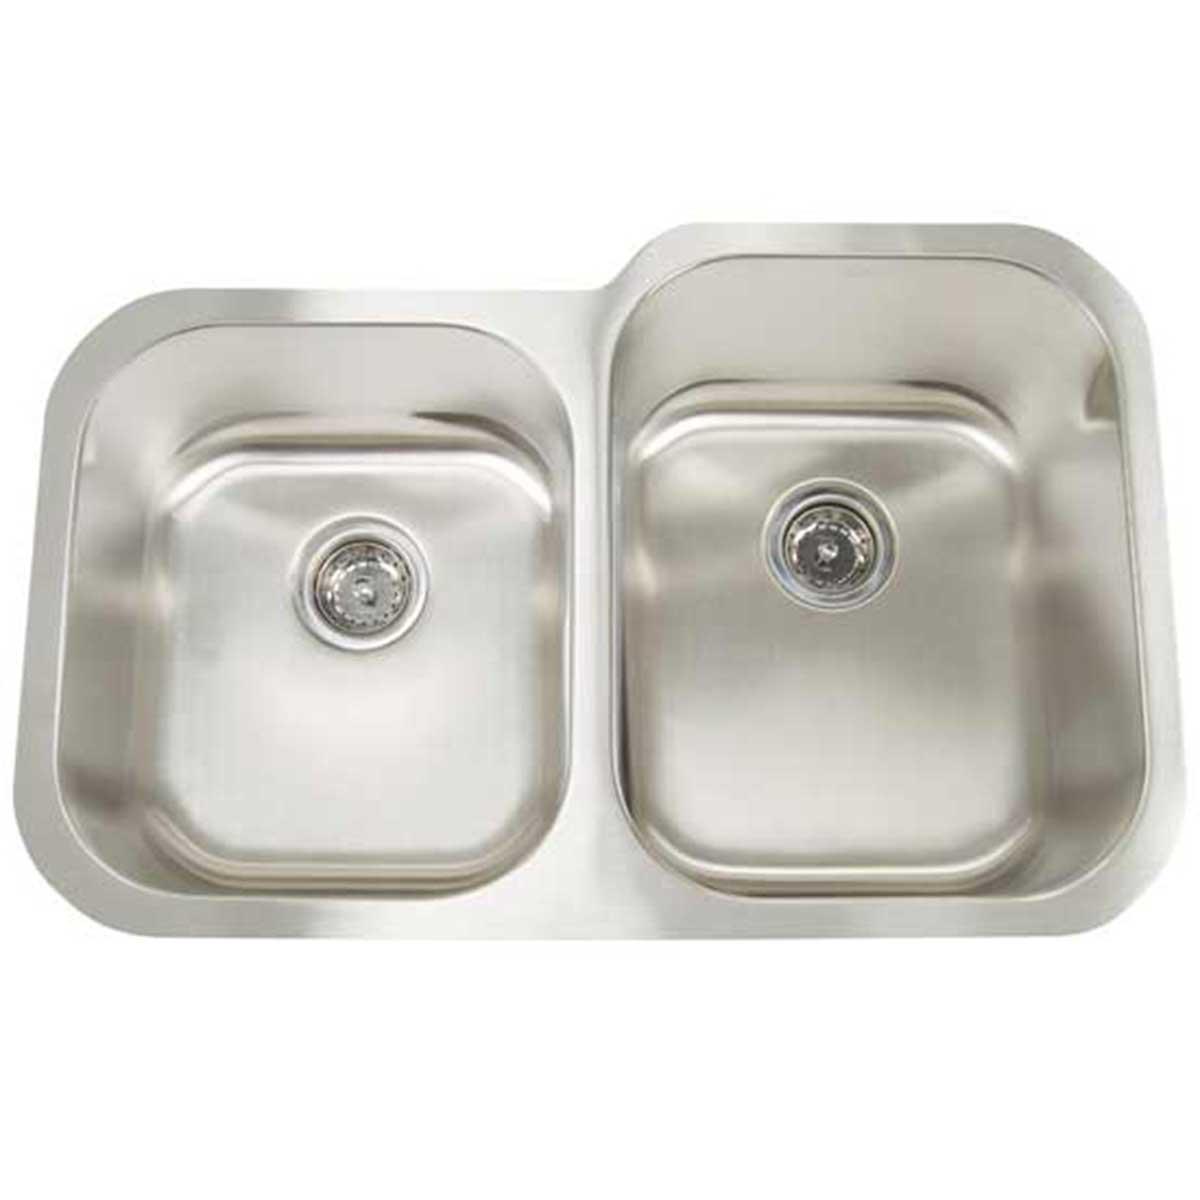 Artisan Reversed Double Bowl Sink